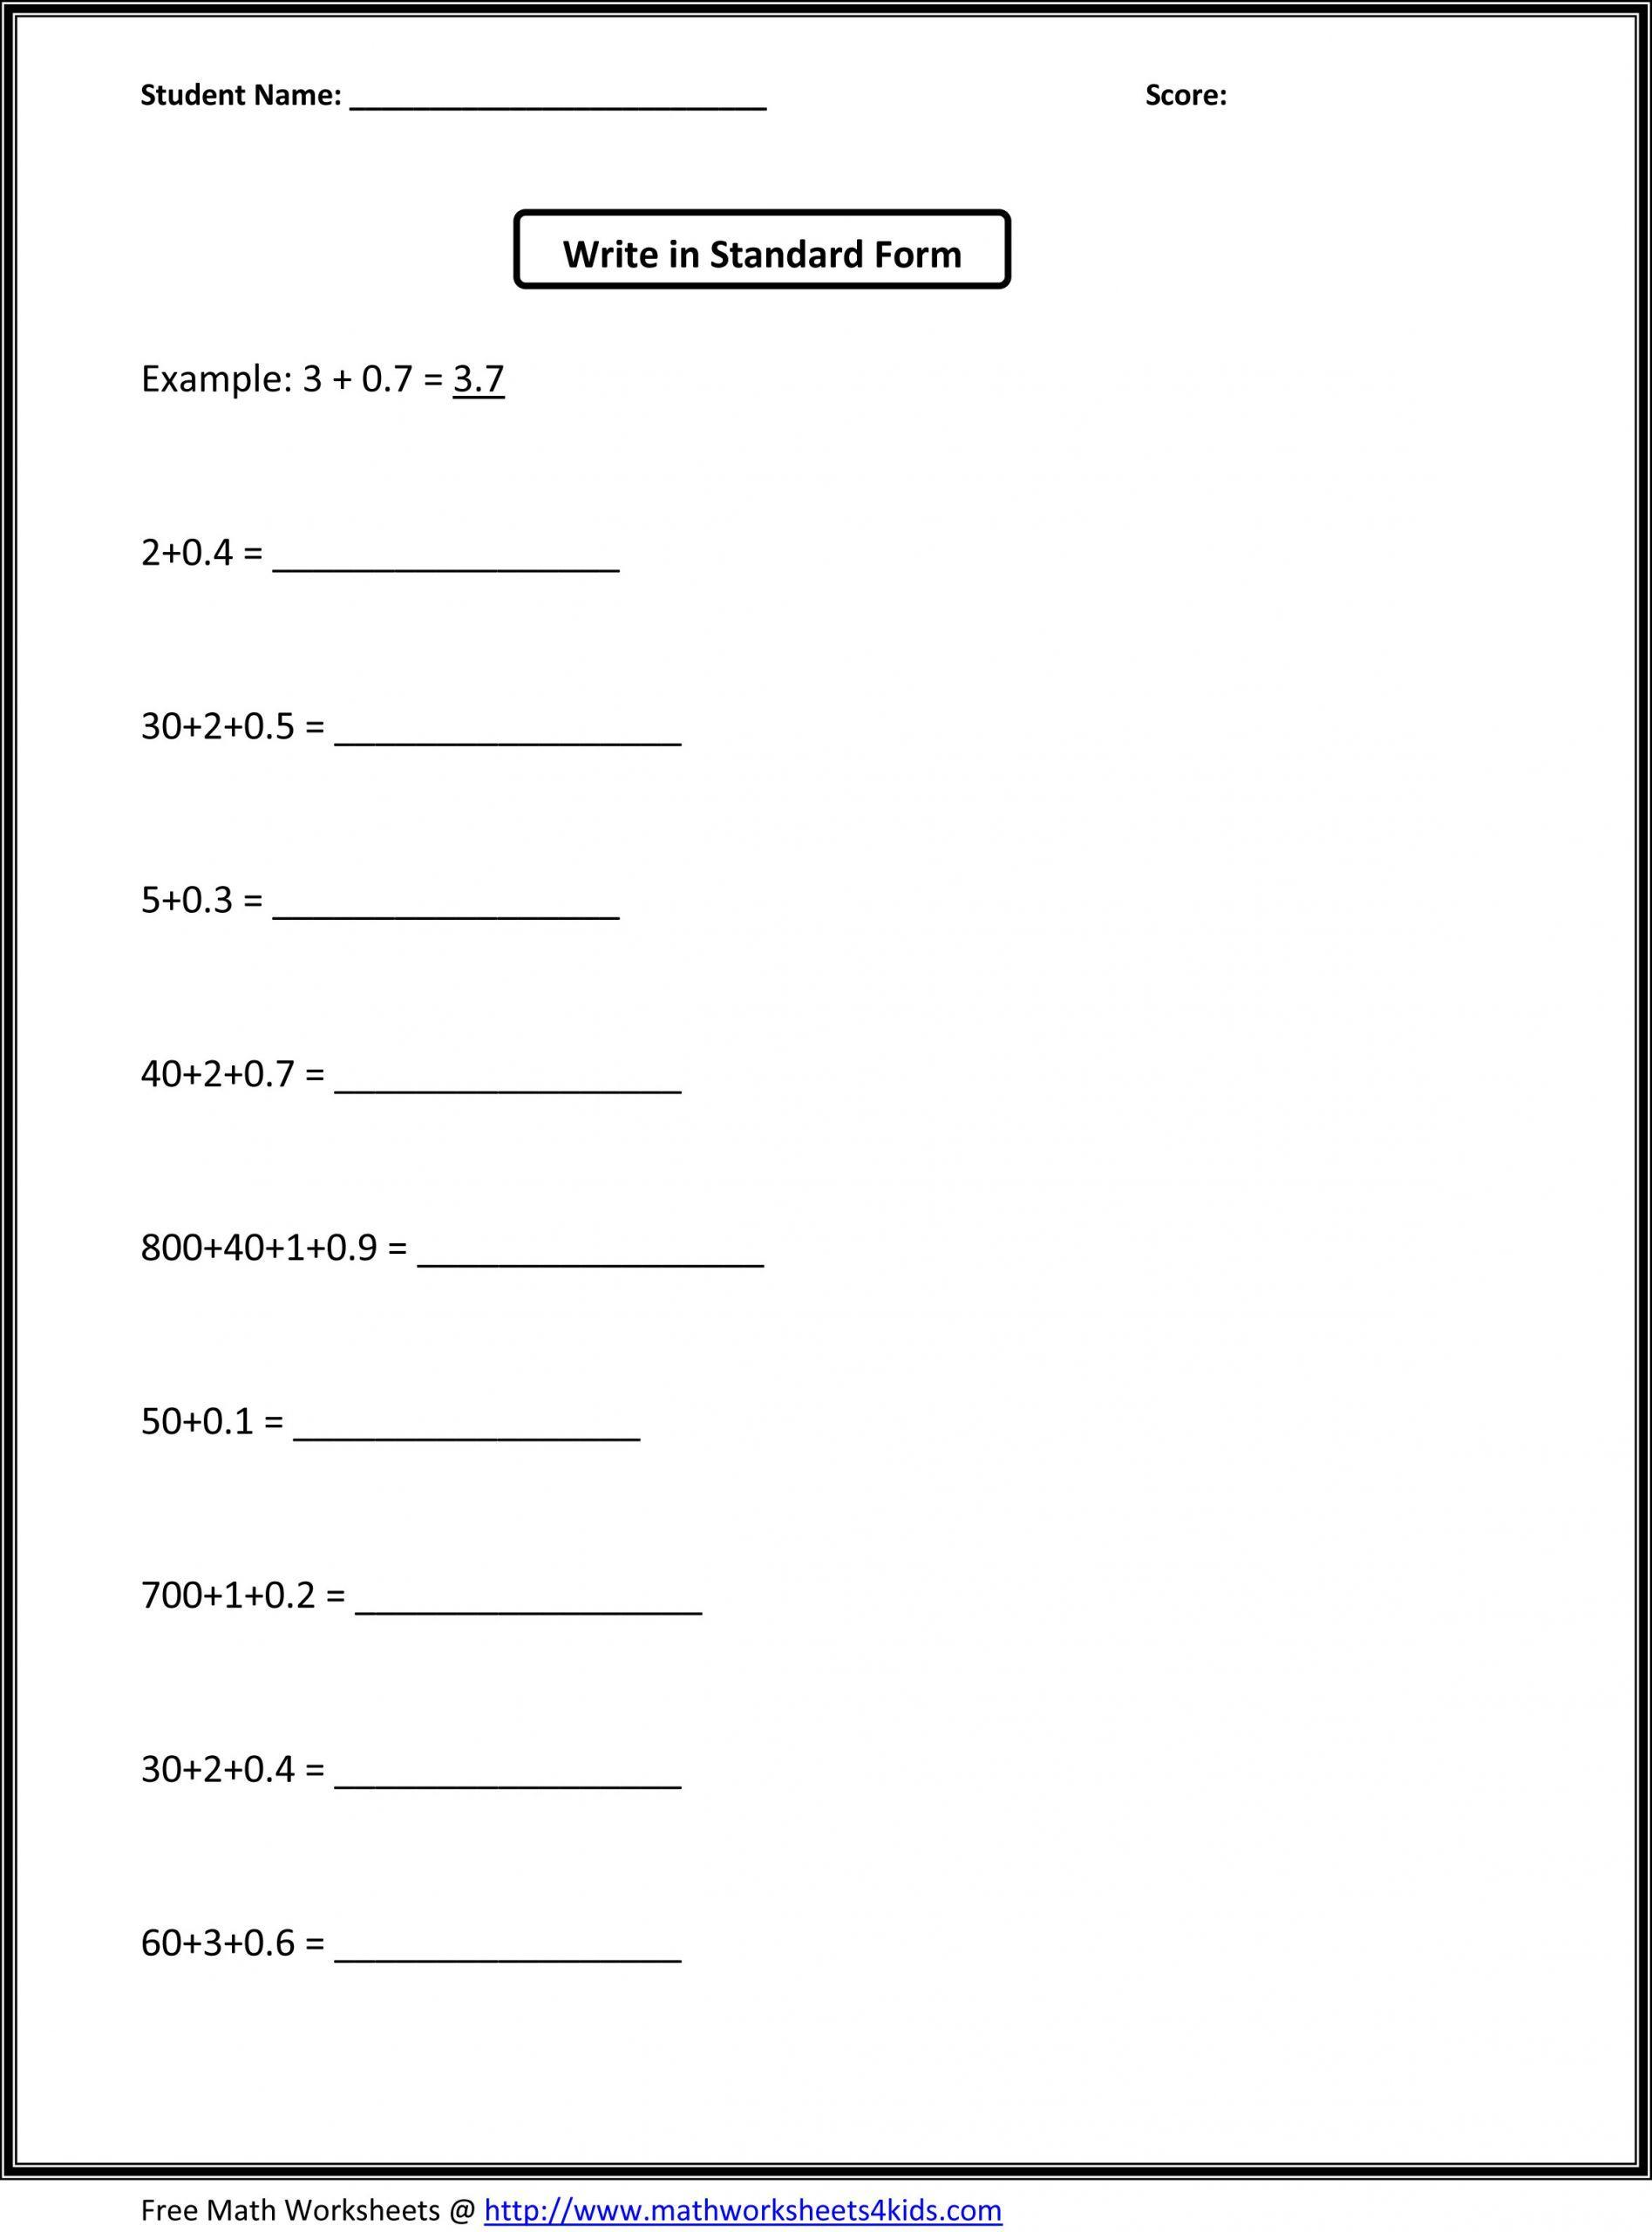 5 Free Math Worksheets Fourth Grade 4 Addition Adding Whole